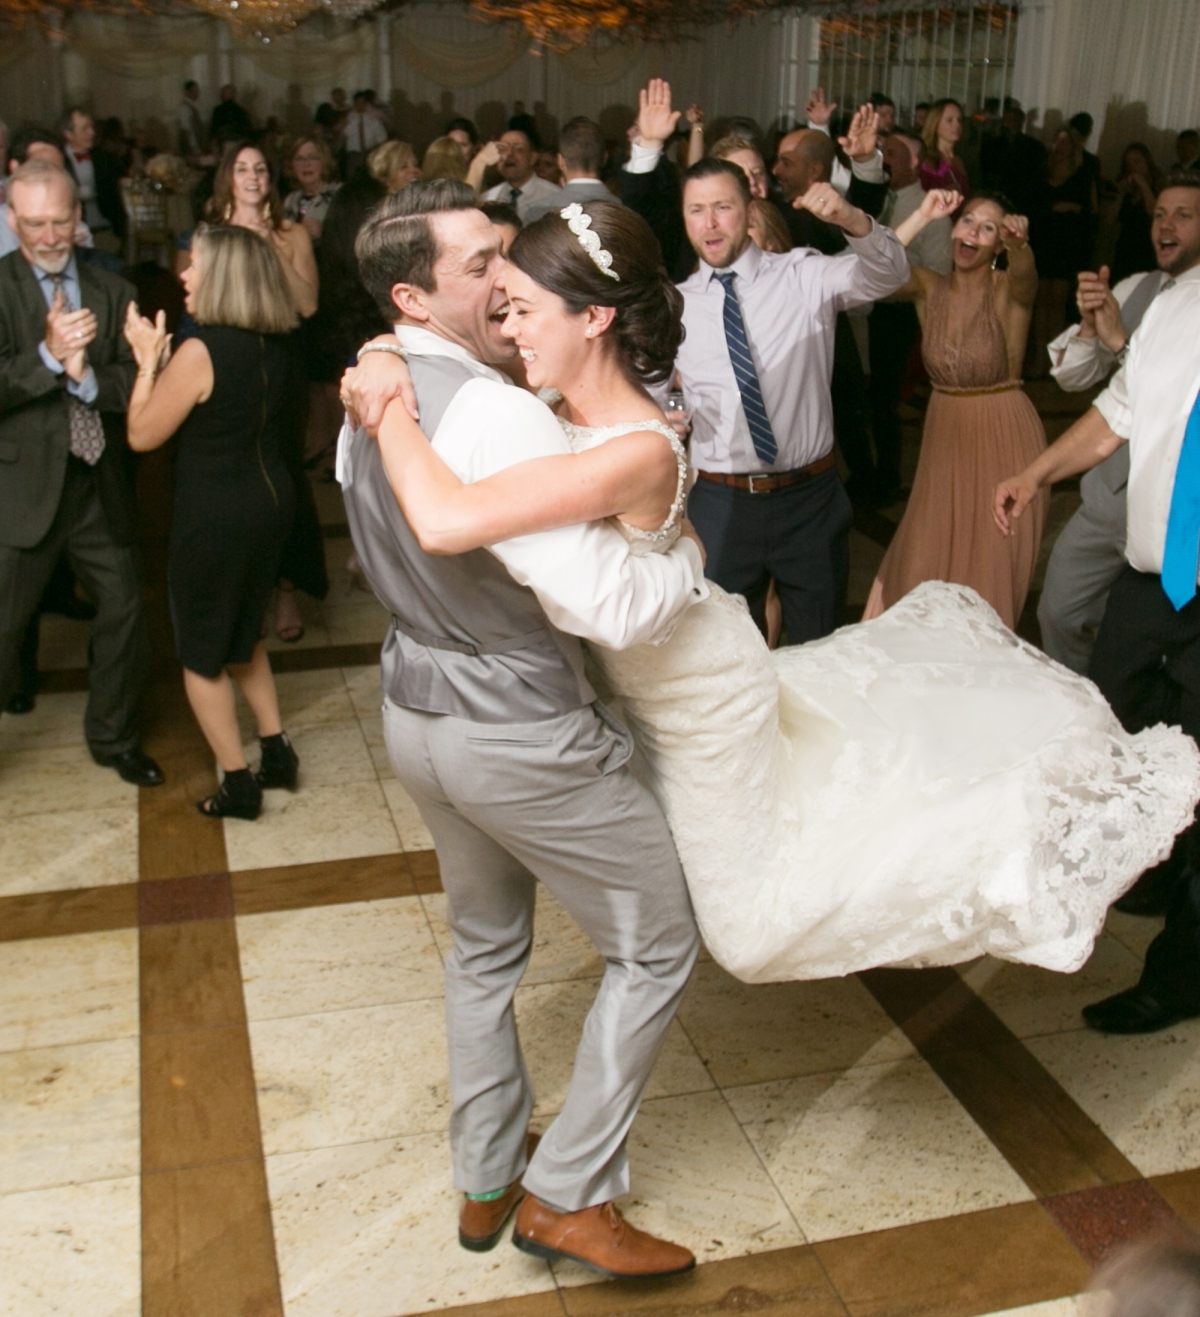 Wedding Song Suggestions-First Dance, Parent Dances, Entrance Music ...